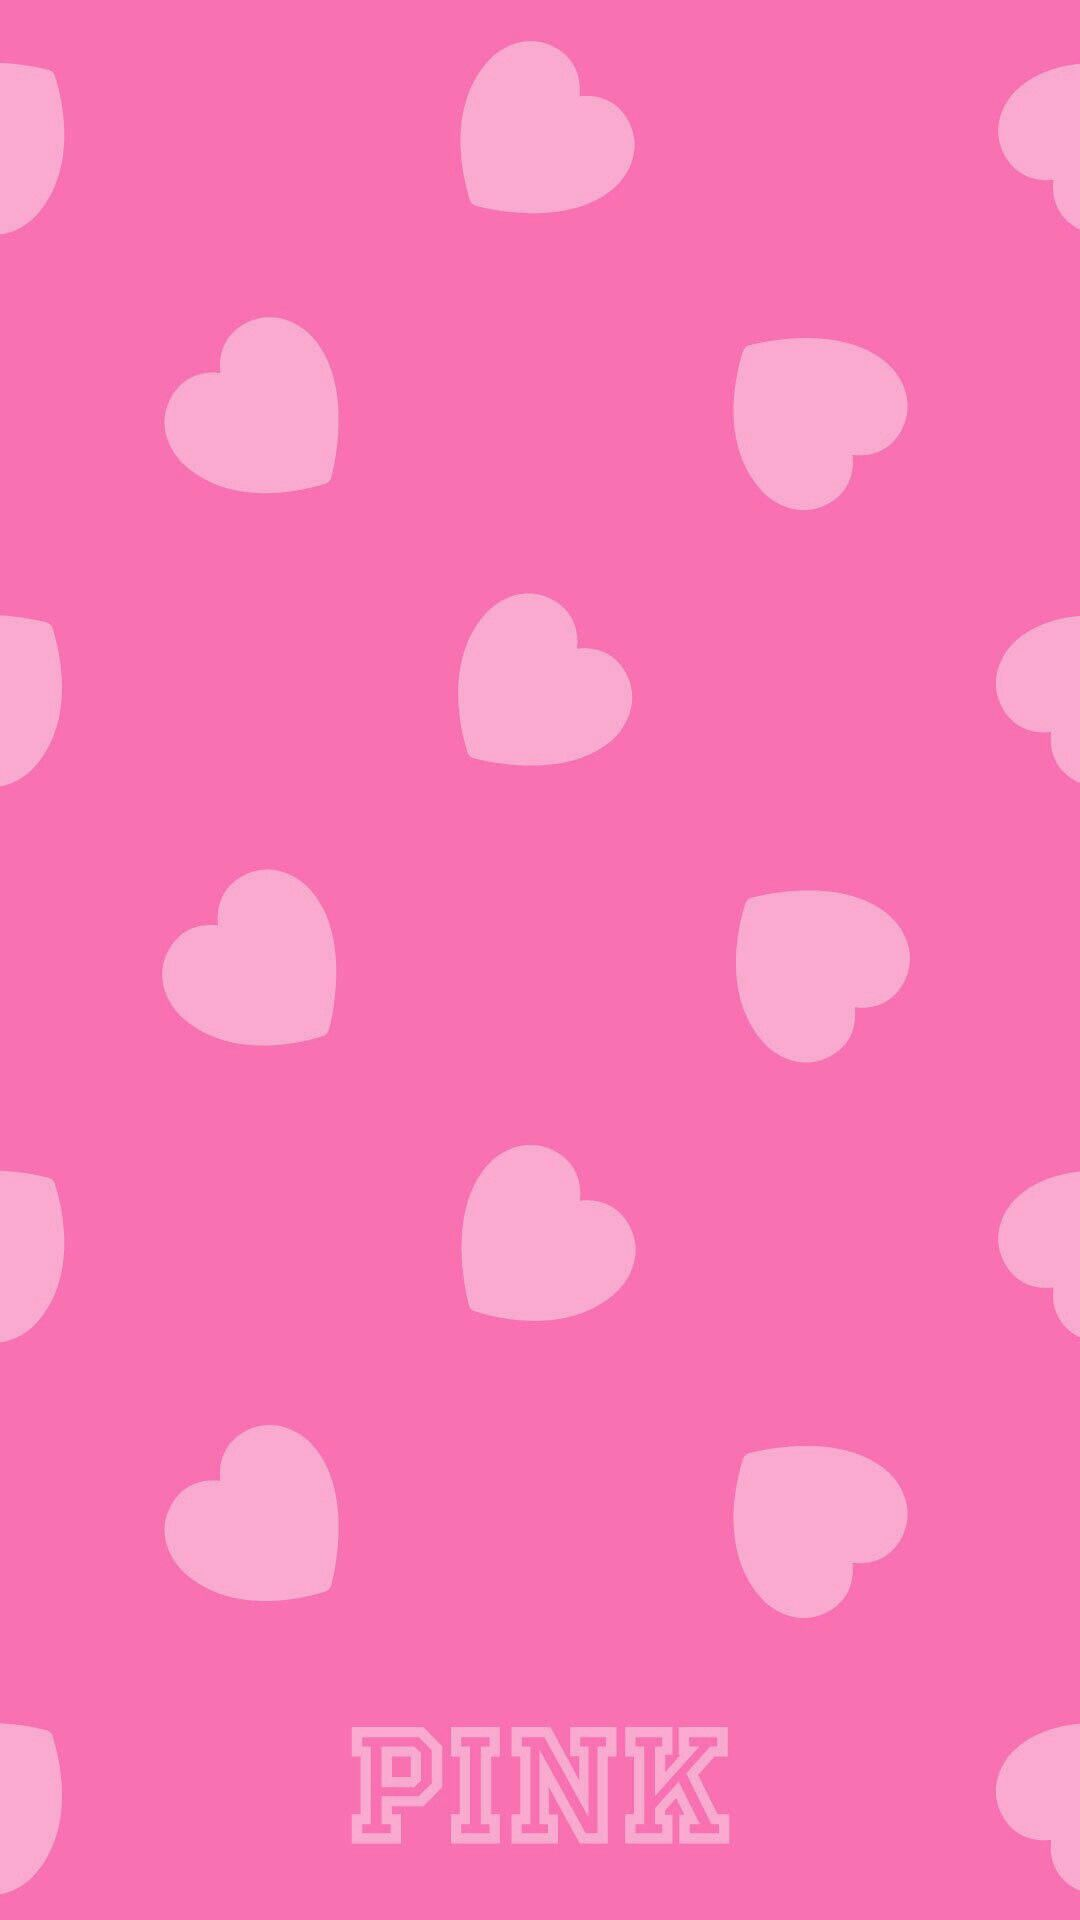 Pink Hearts Pink Wallpaper Girly Phone Wallpaper Pink Pink